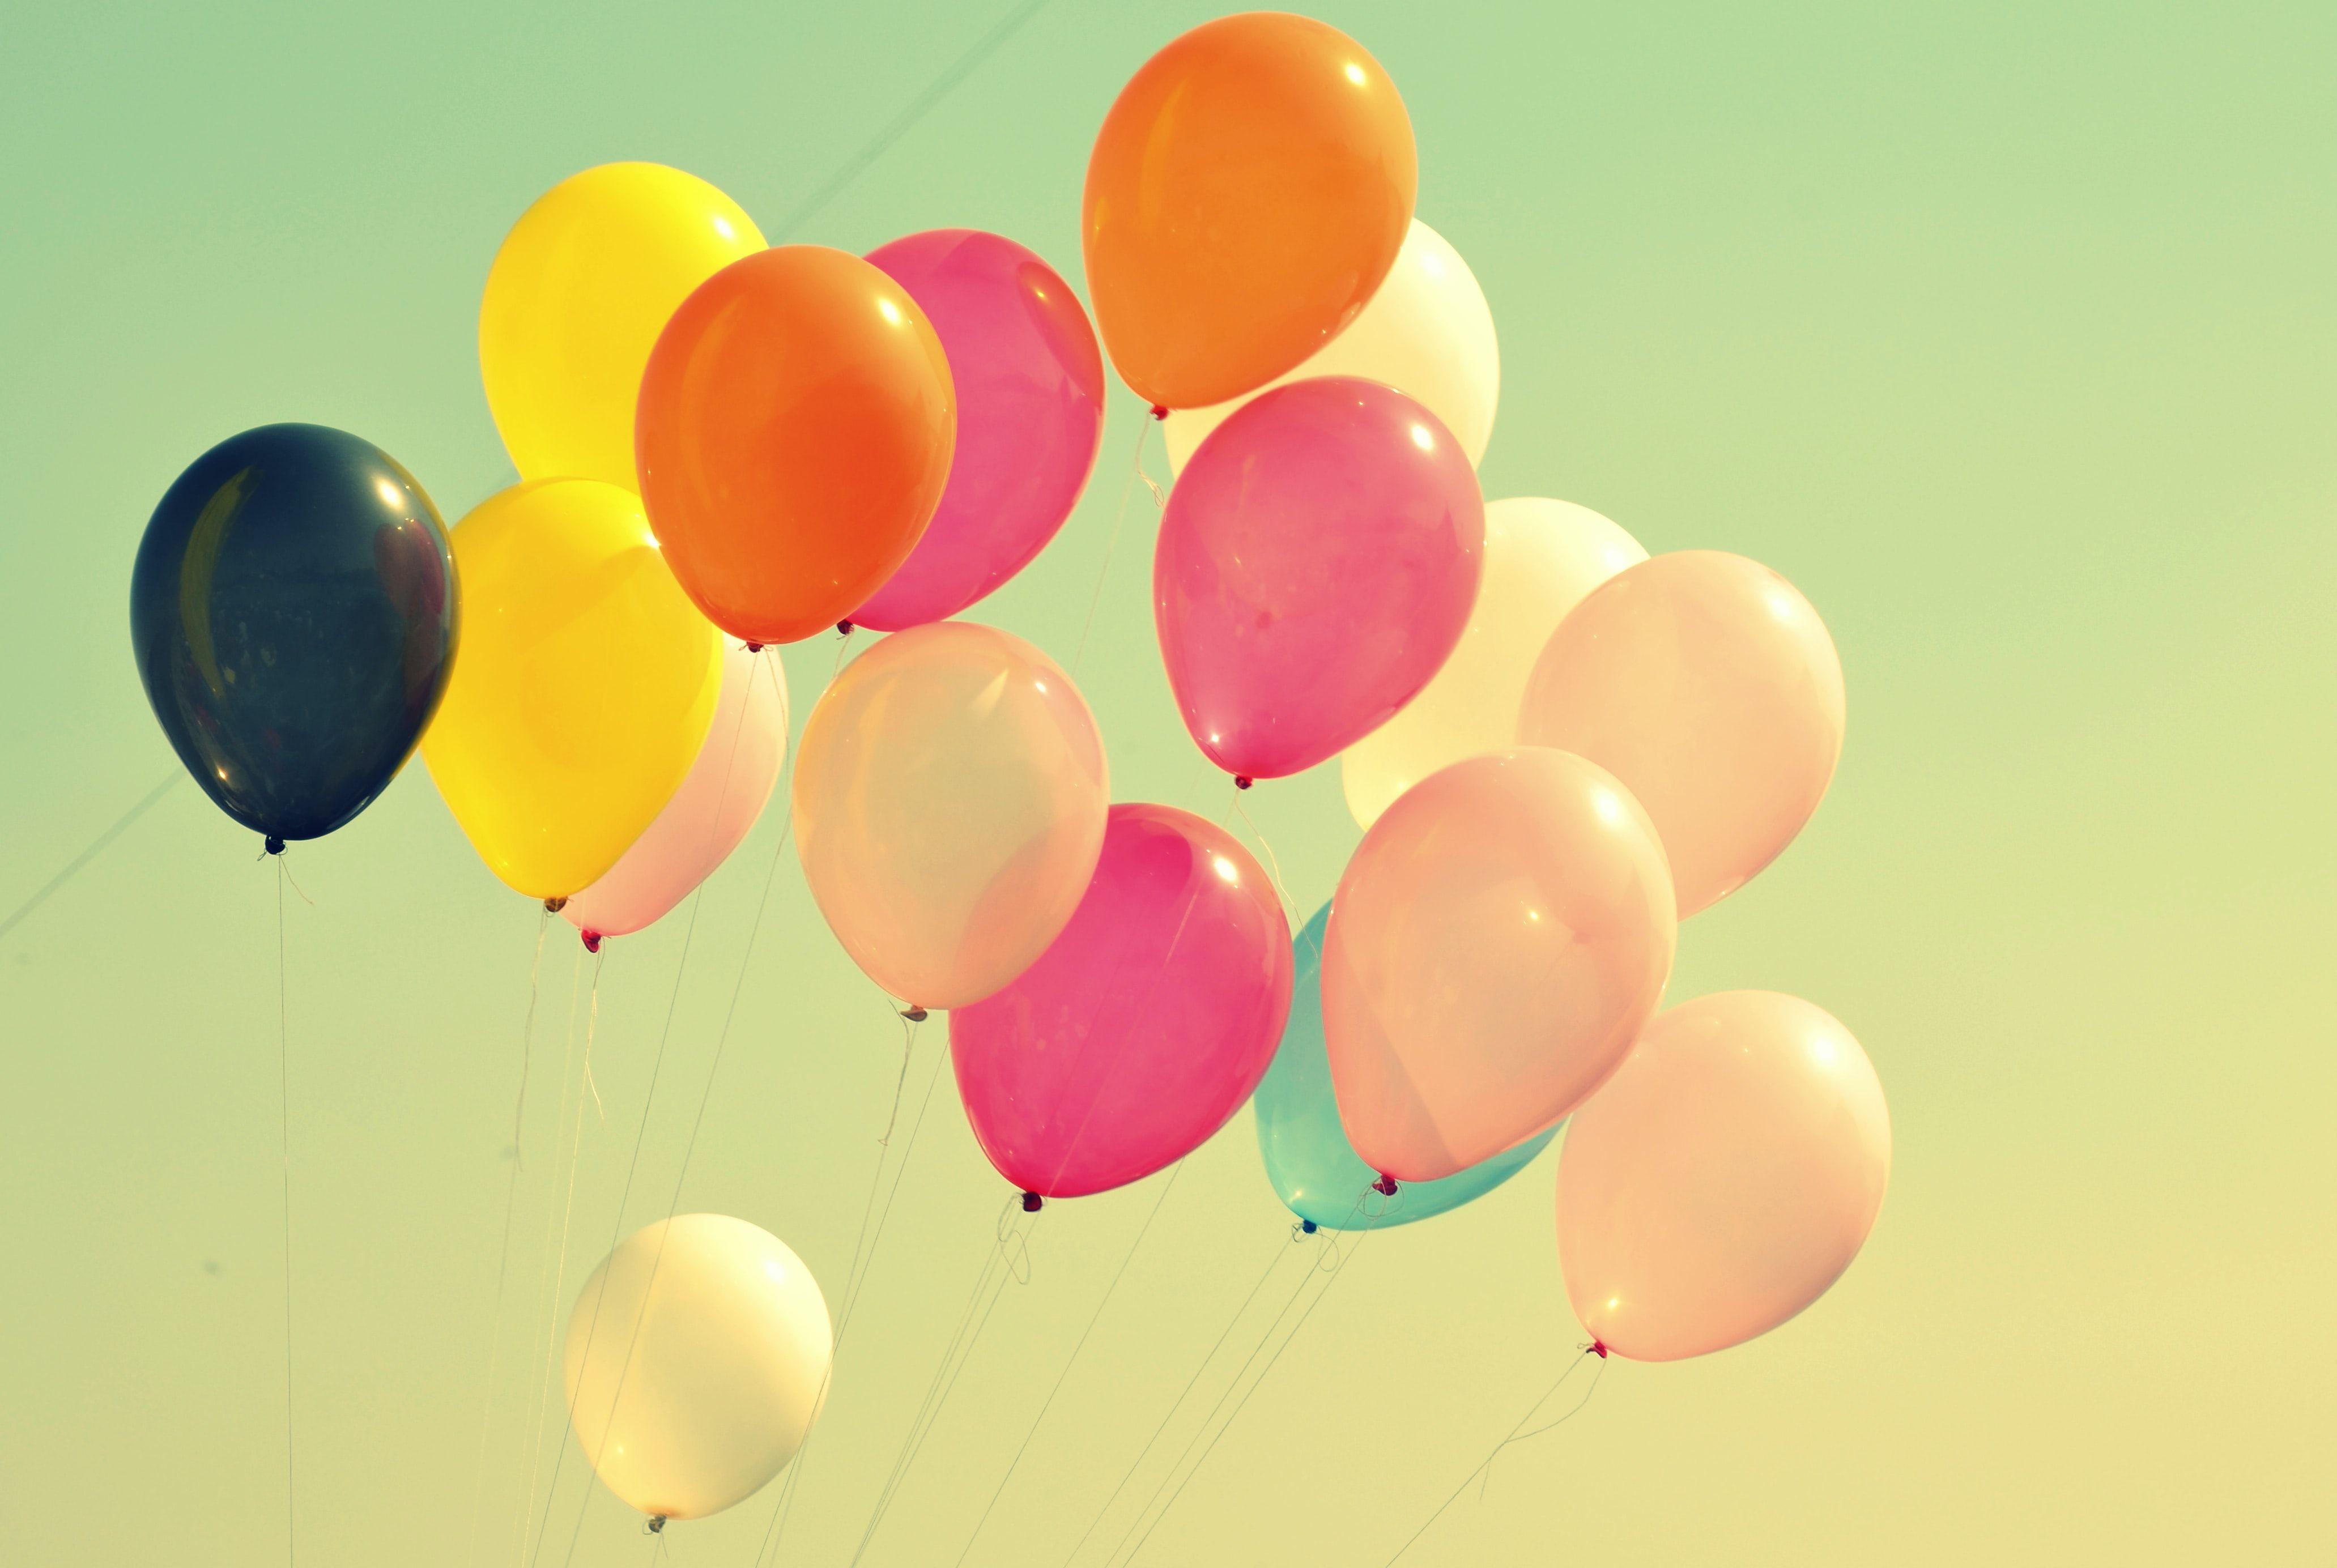 I Celebrated My 40th Birthday In Lockdown